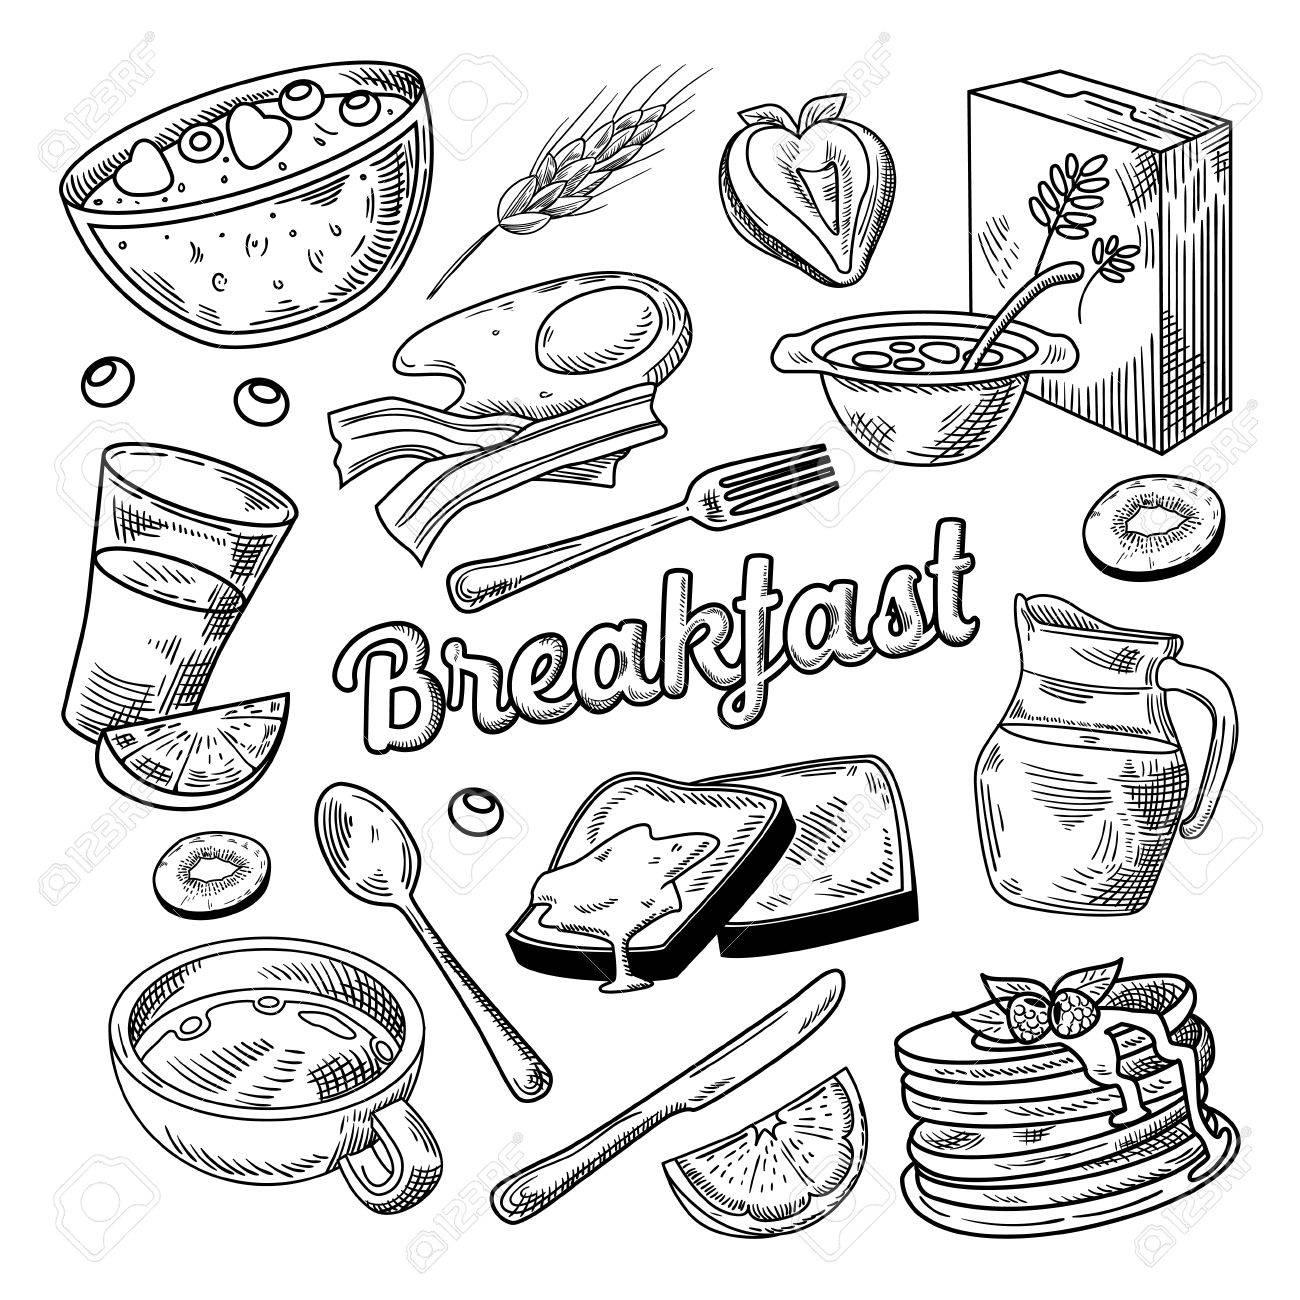 Healthy Breakfast Hand Drawn Doodle - 86537641